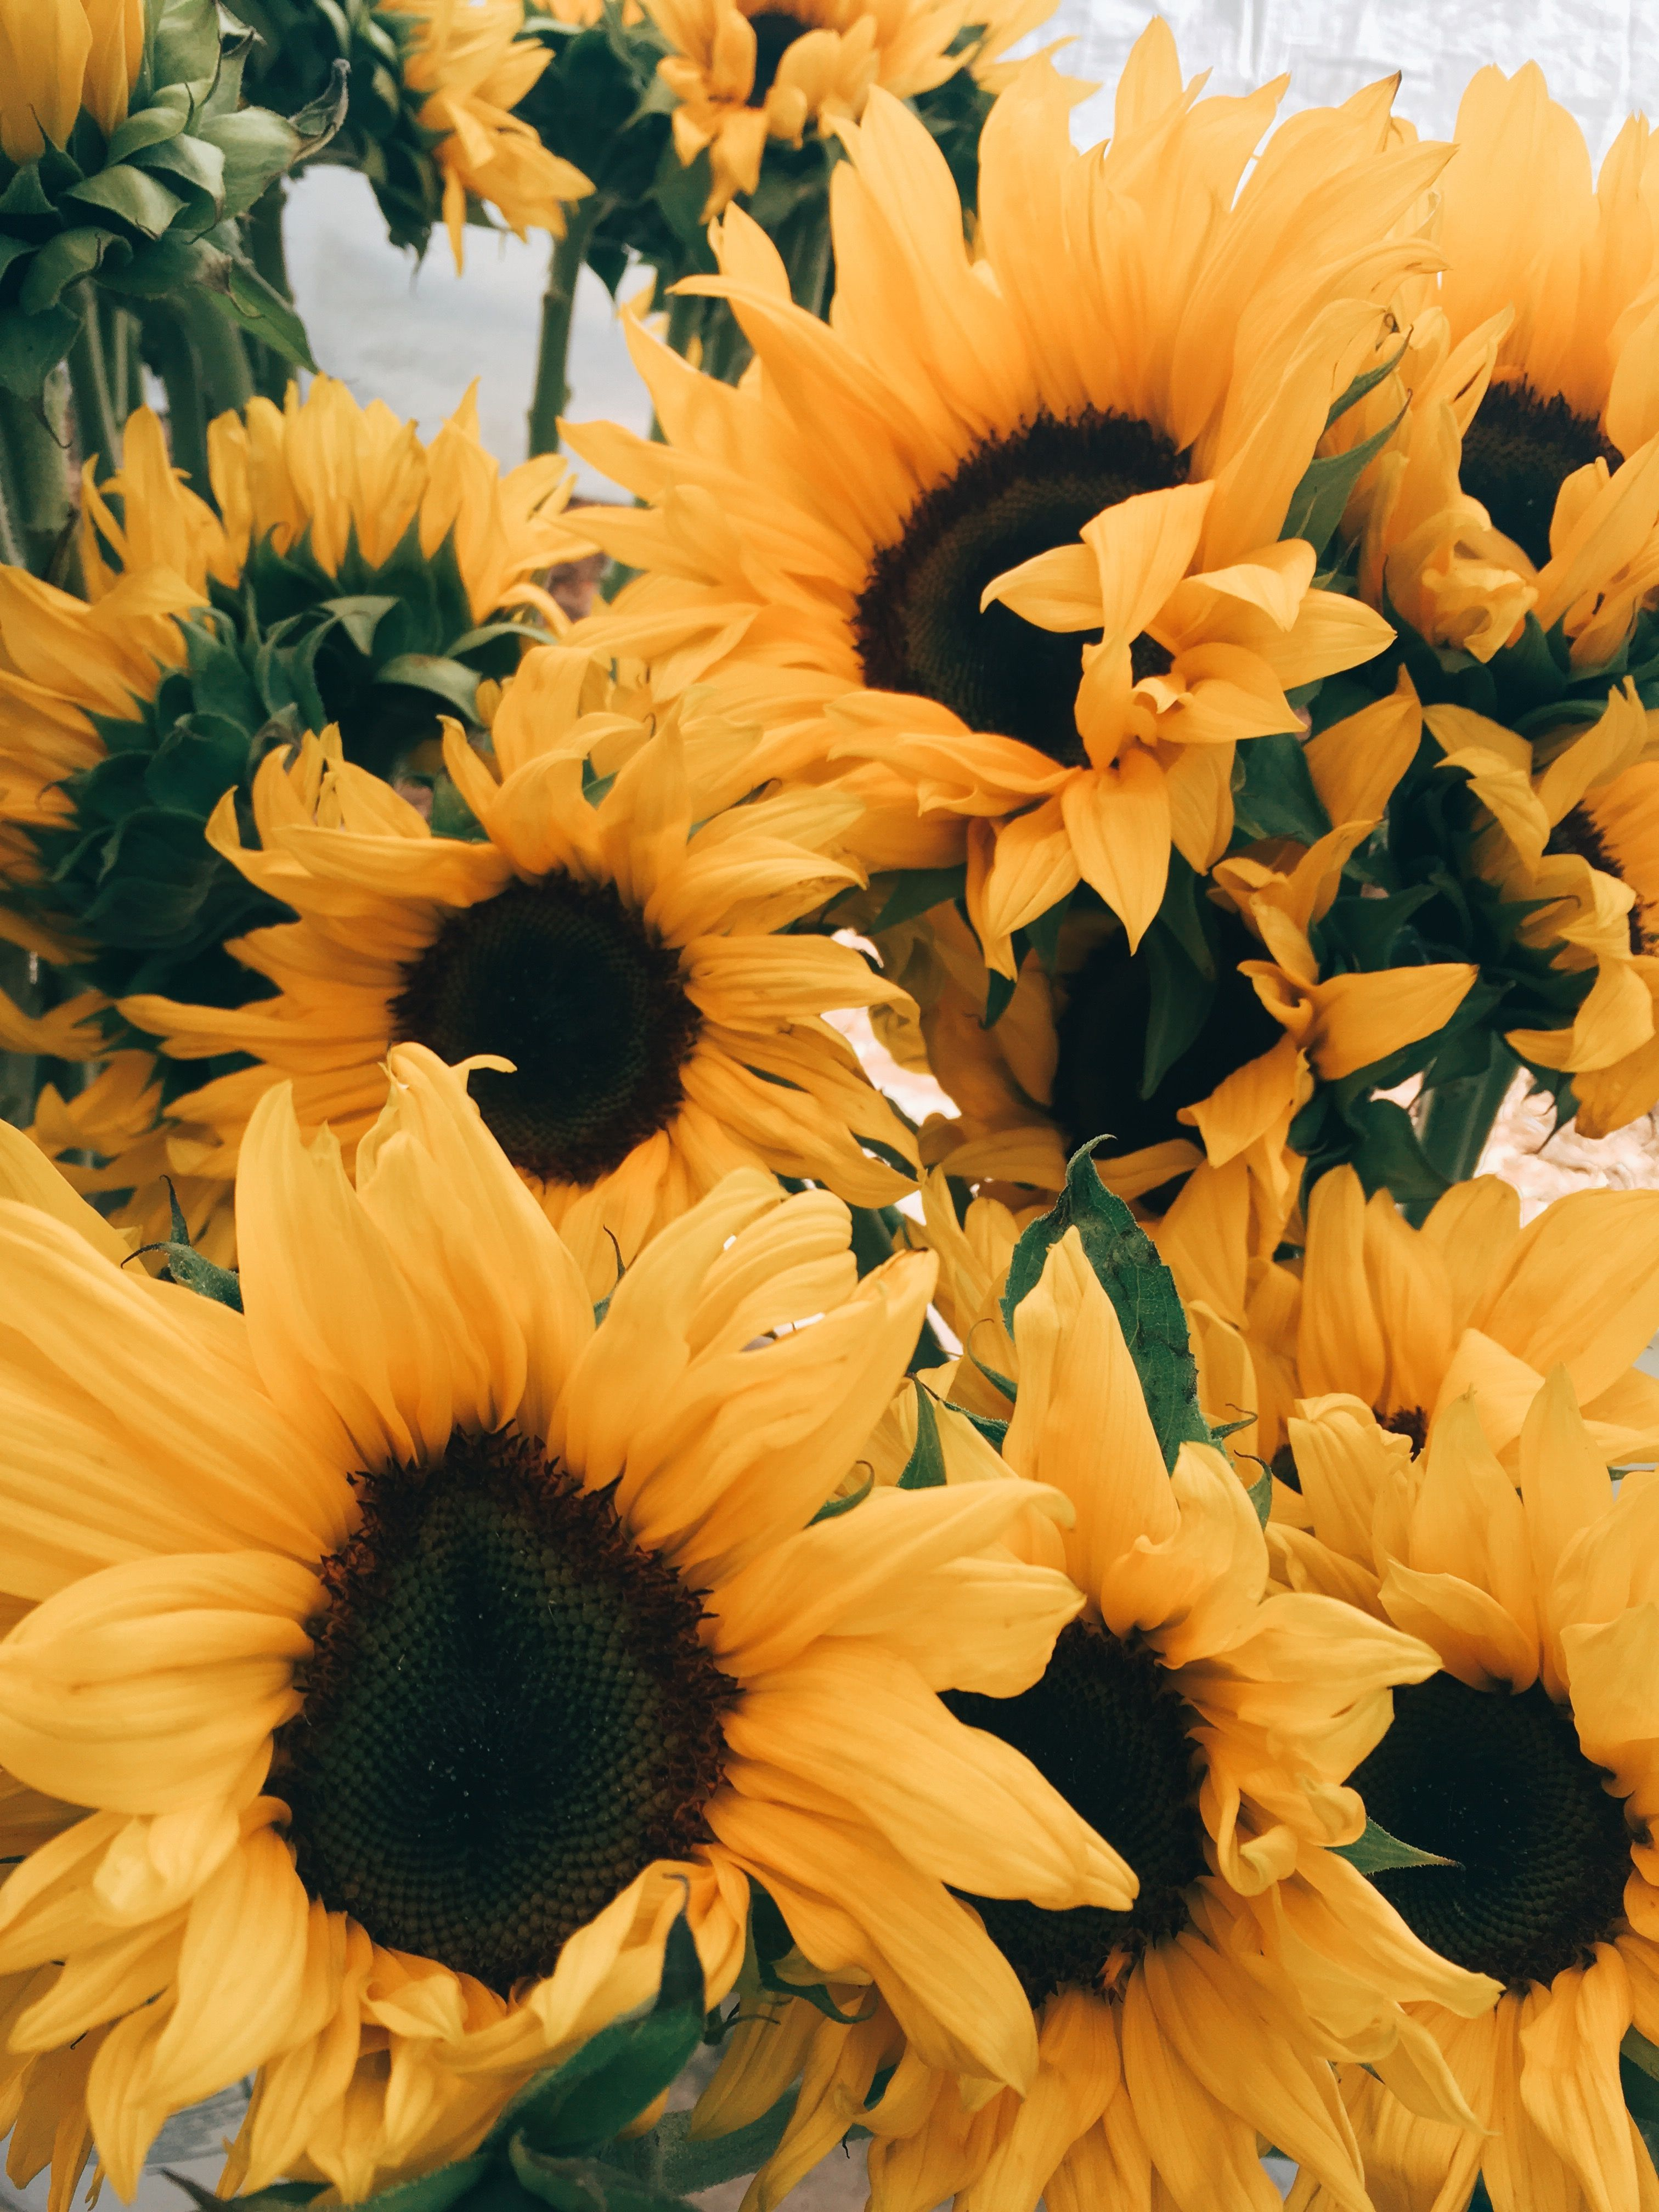 Cute Aesthetic Sunflower Wallpaper